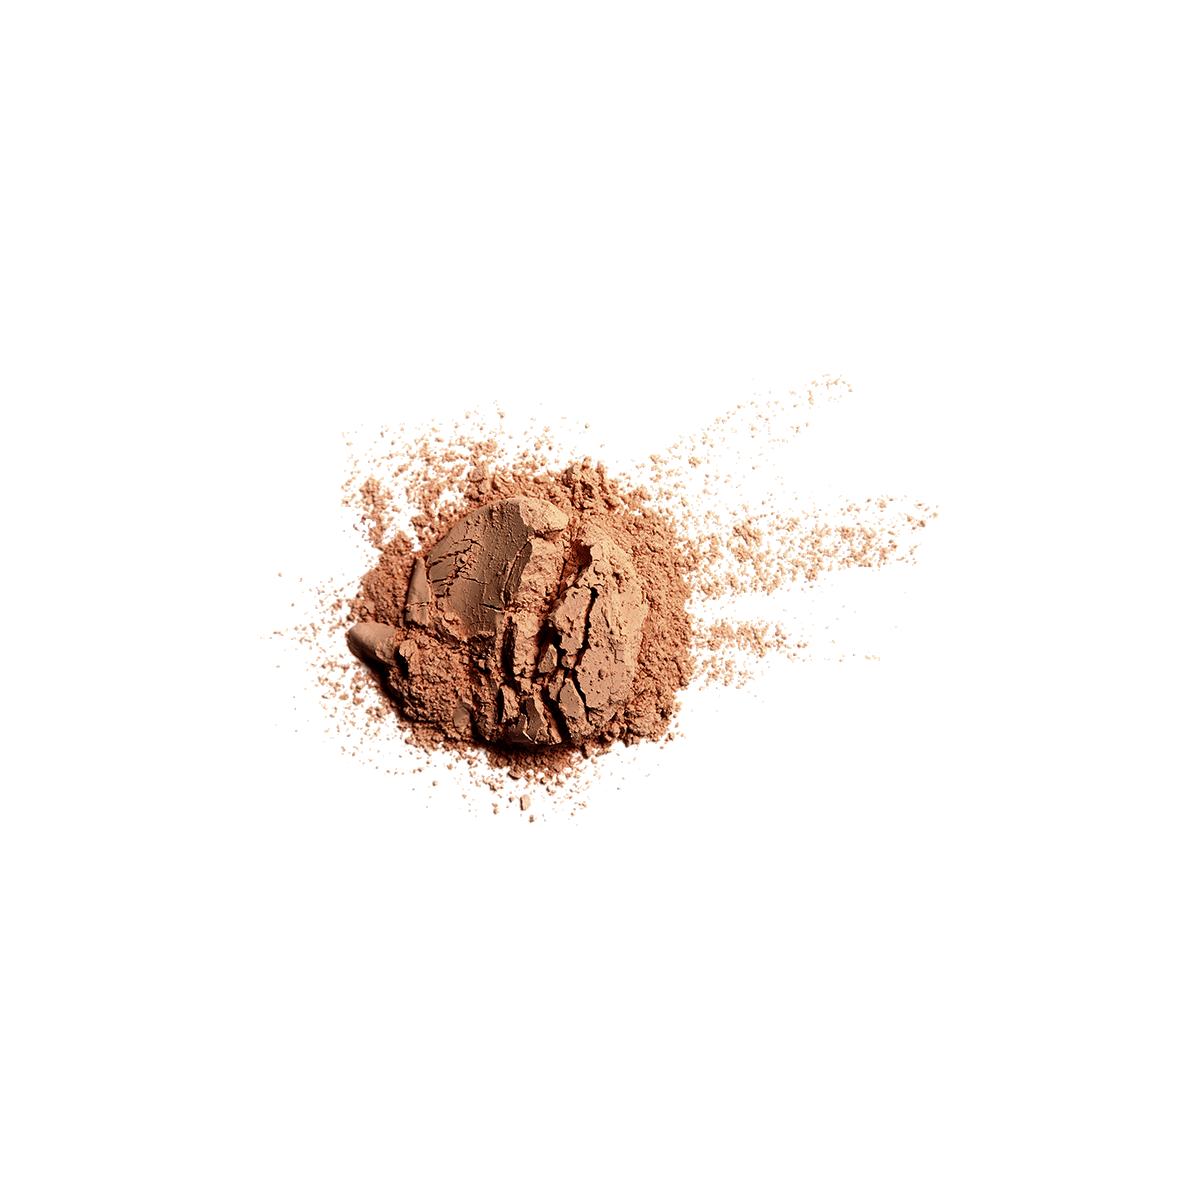 collab-set-the-stage-ultra-fine-loose-setting-powder-tawnymocha-shade.png